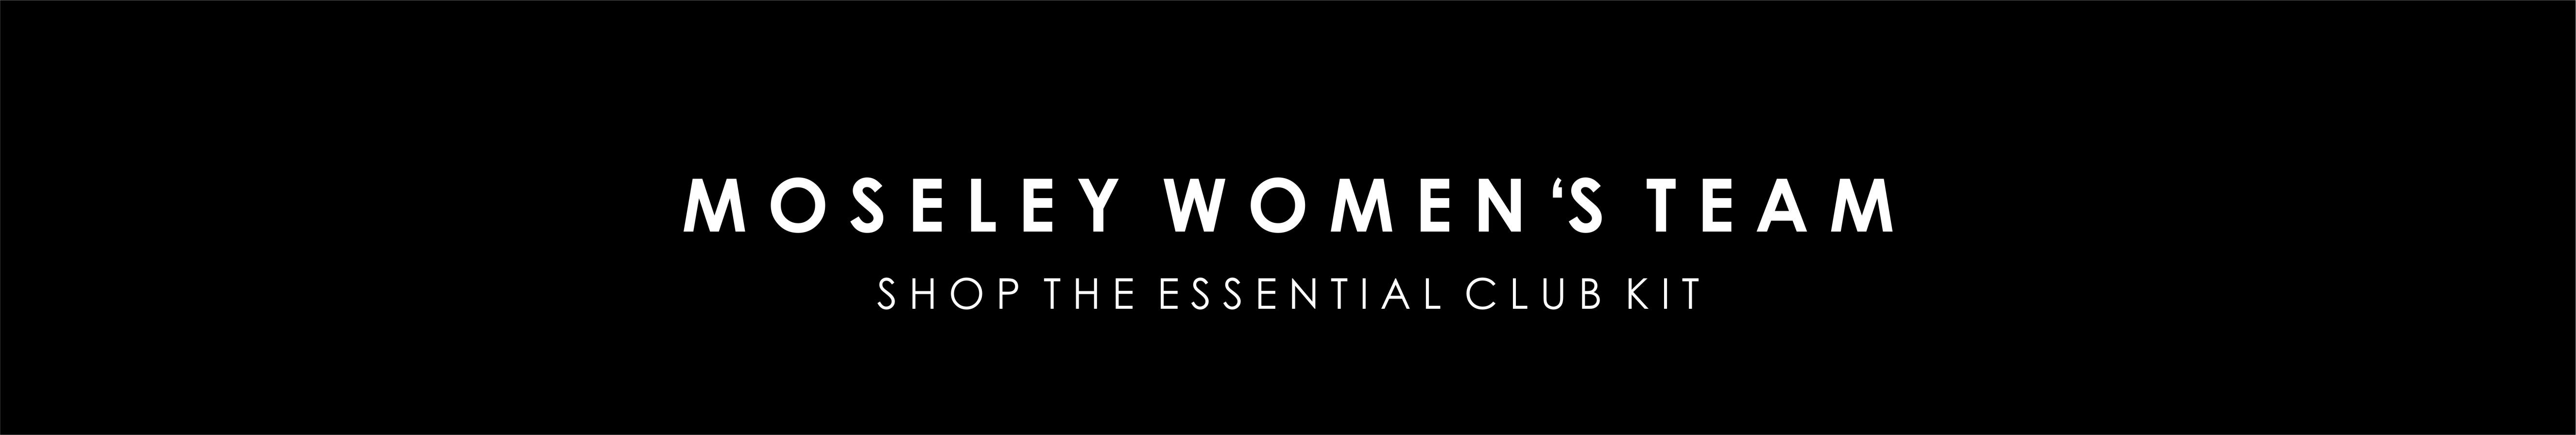 moseley-womens-team-banner.jpg